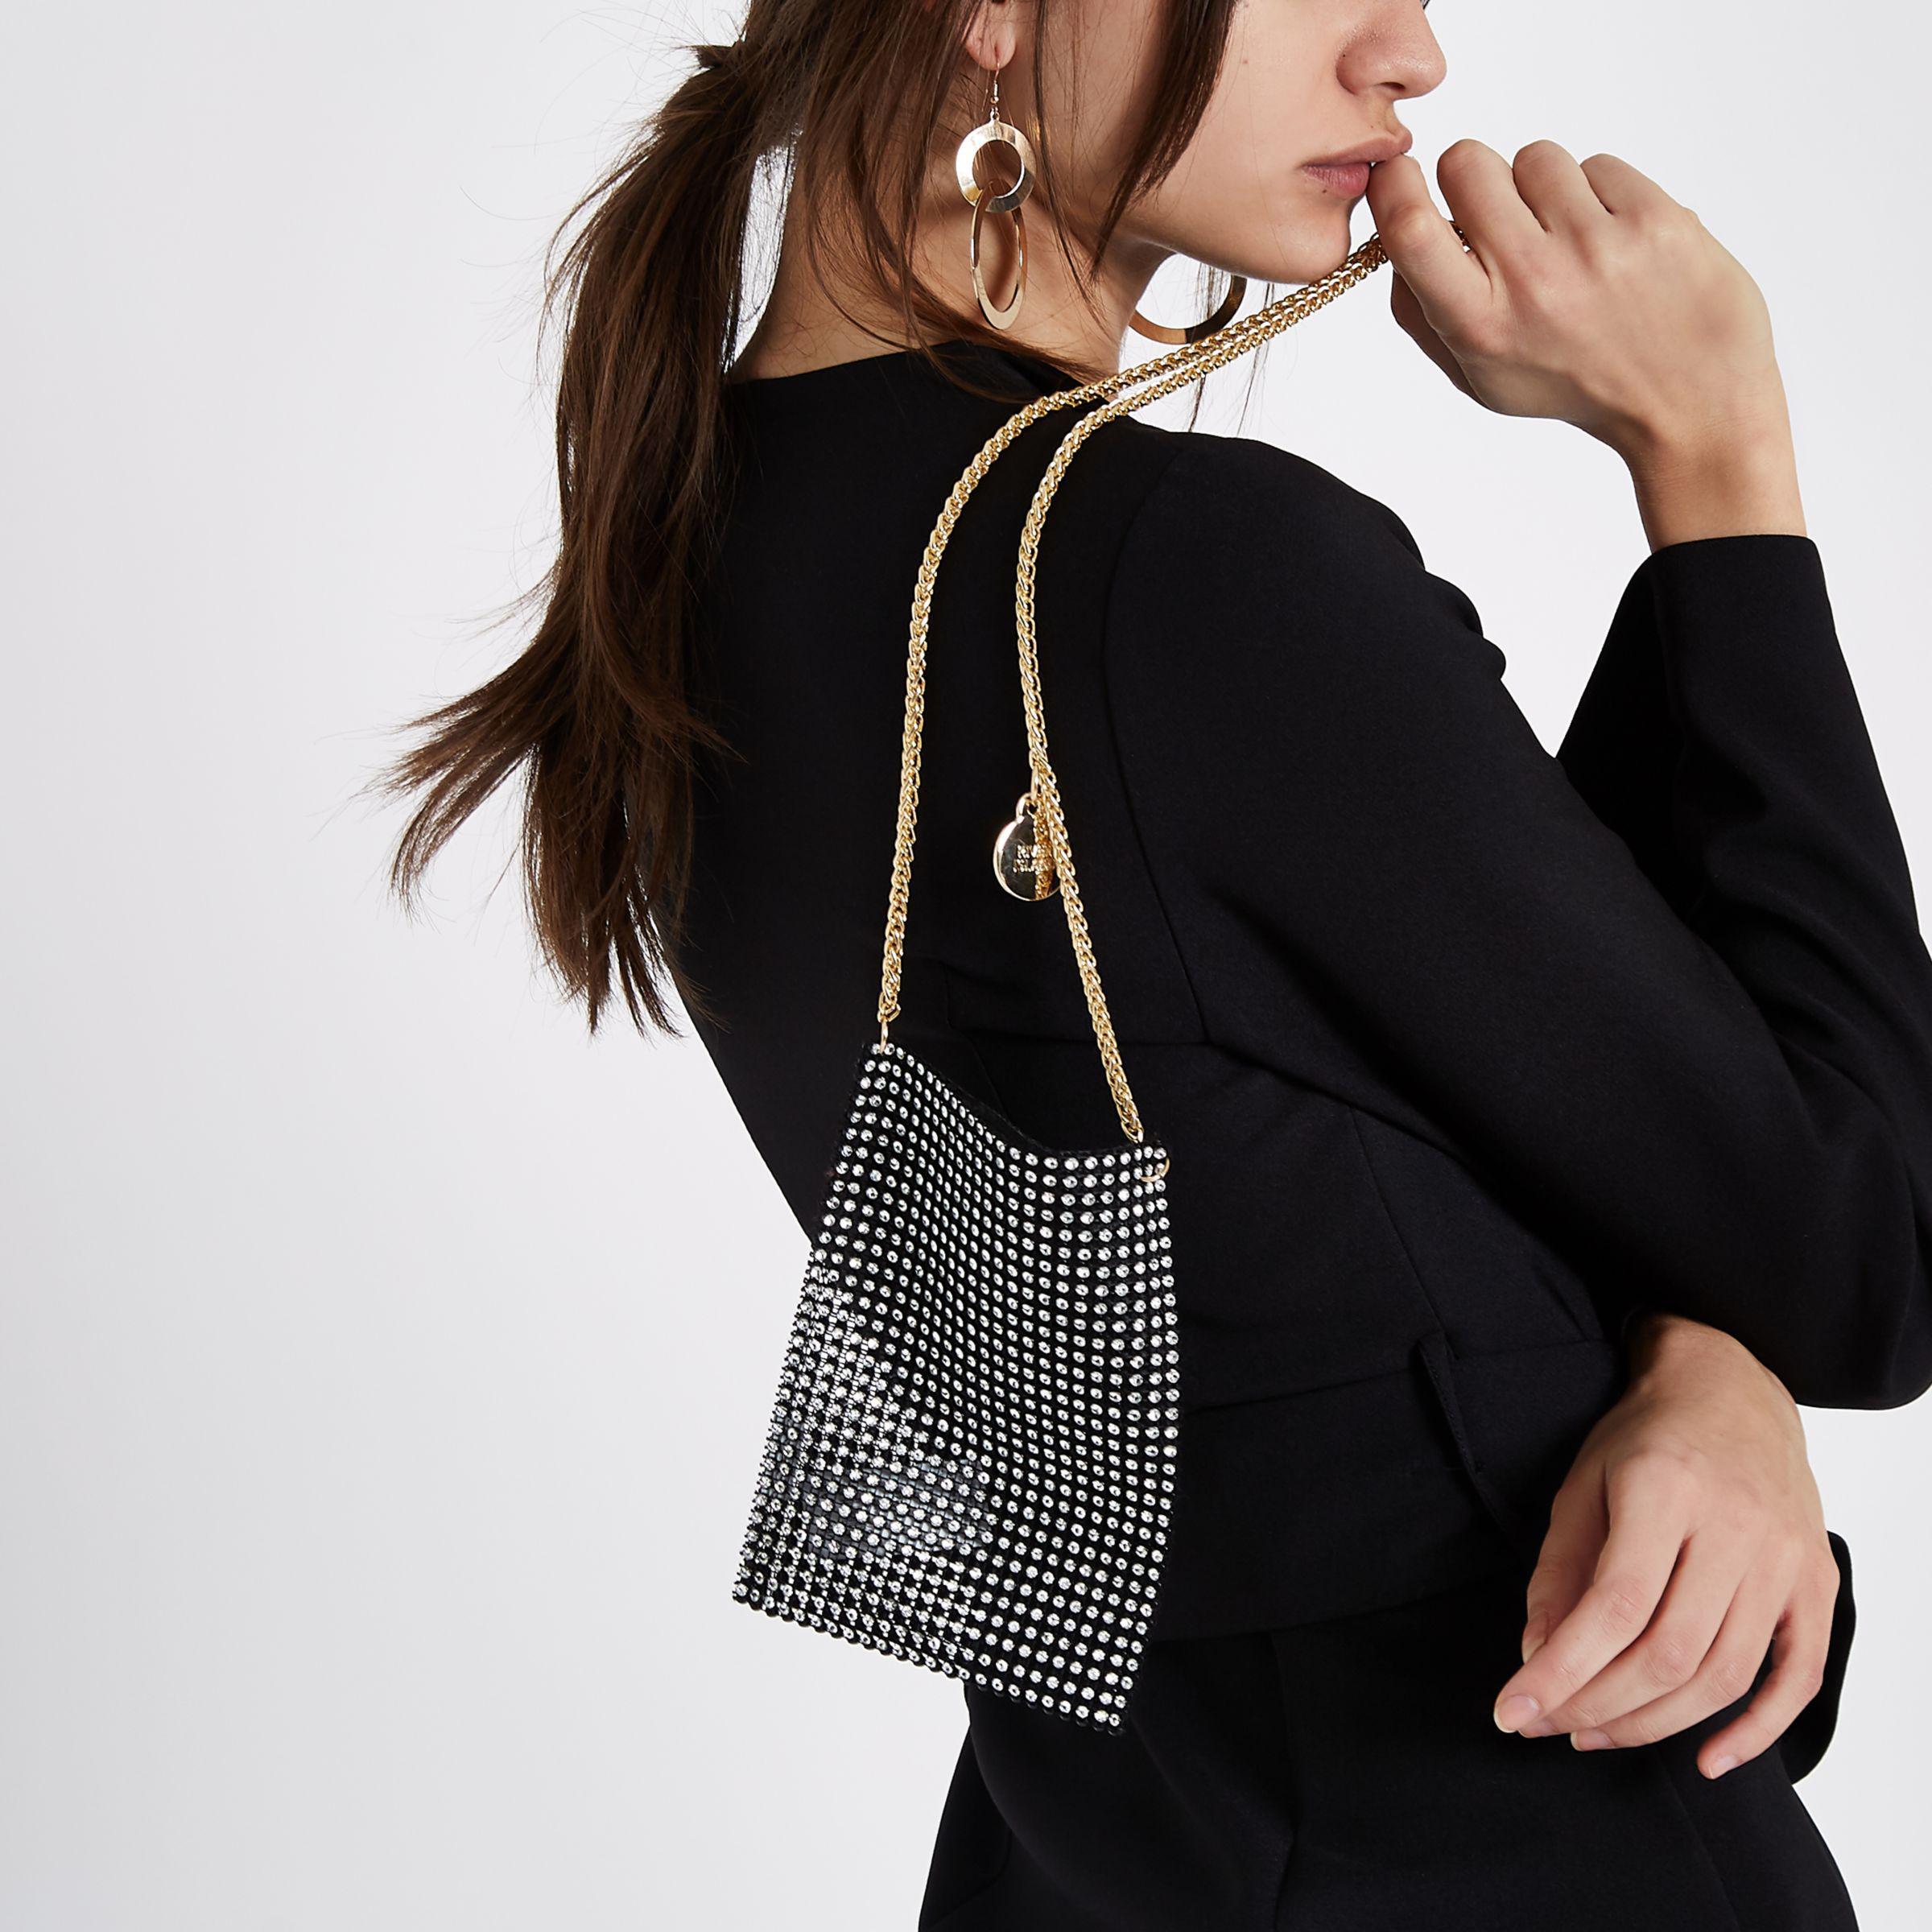 River Island Synthetic Black Diamante Cross Body Chain Pouch Bag